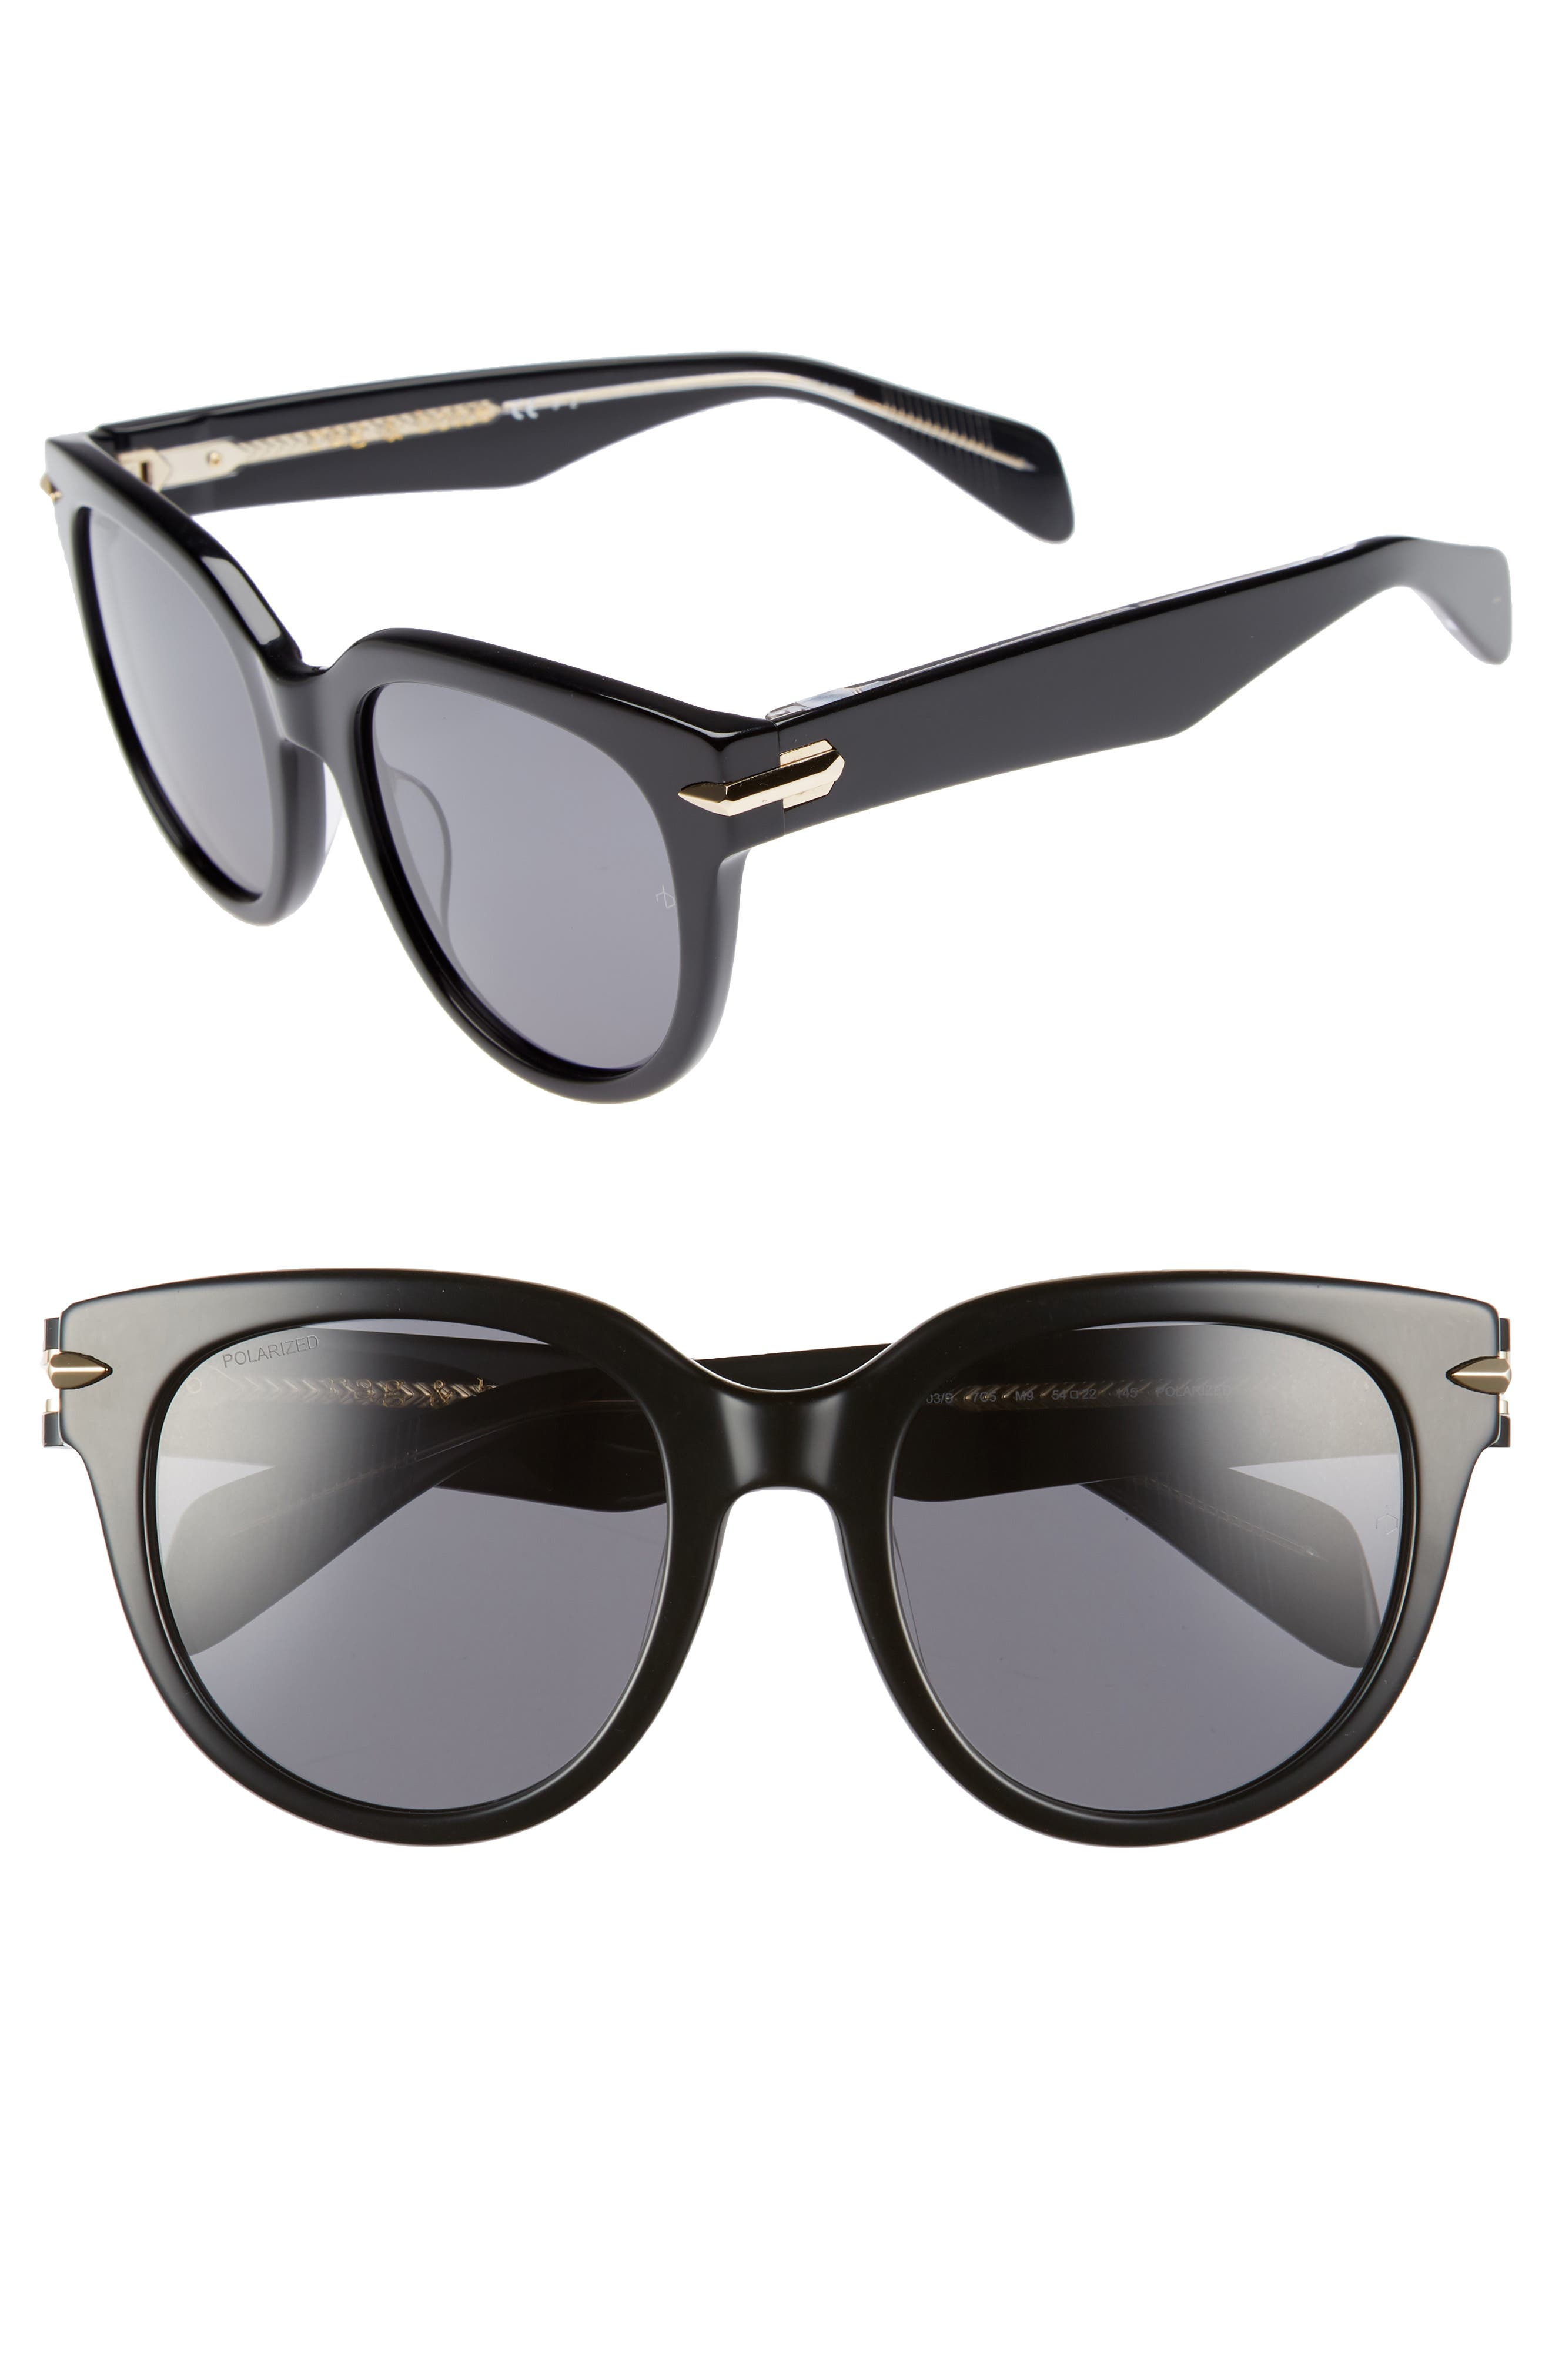 54mm Round Sunglasses,                             Main thumbnail 1, color,                             BLACK/ CRYSTAL